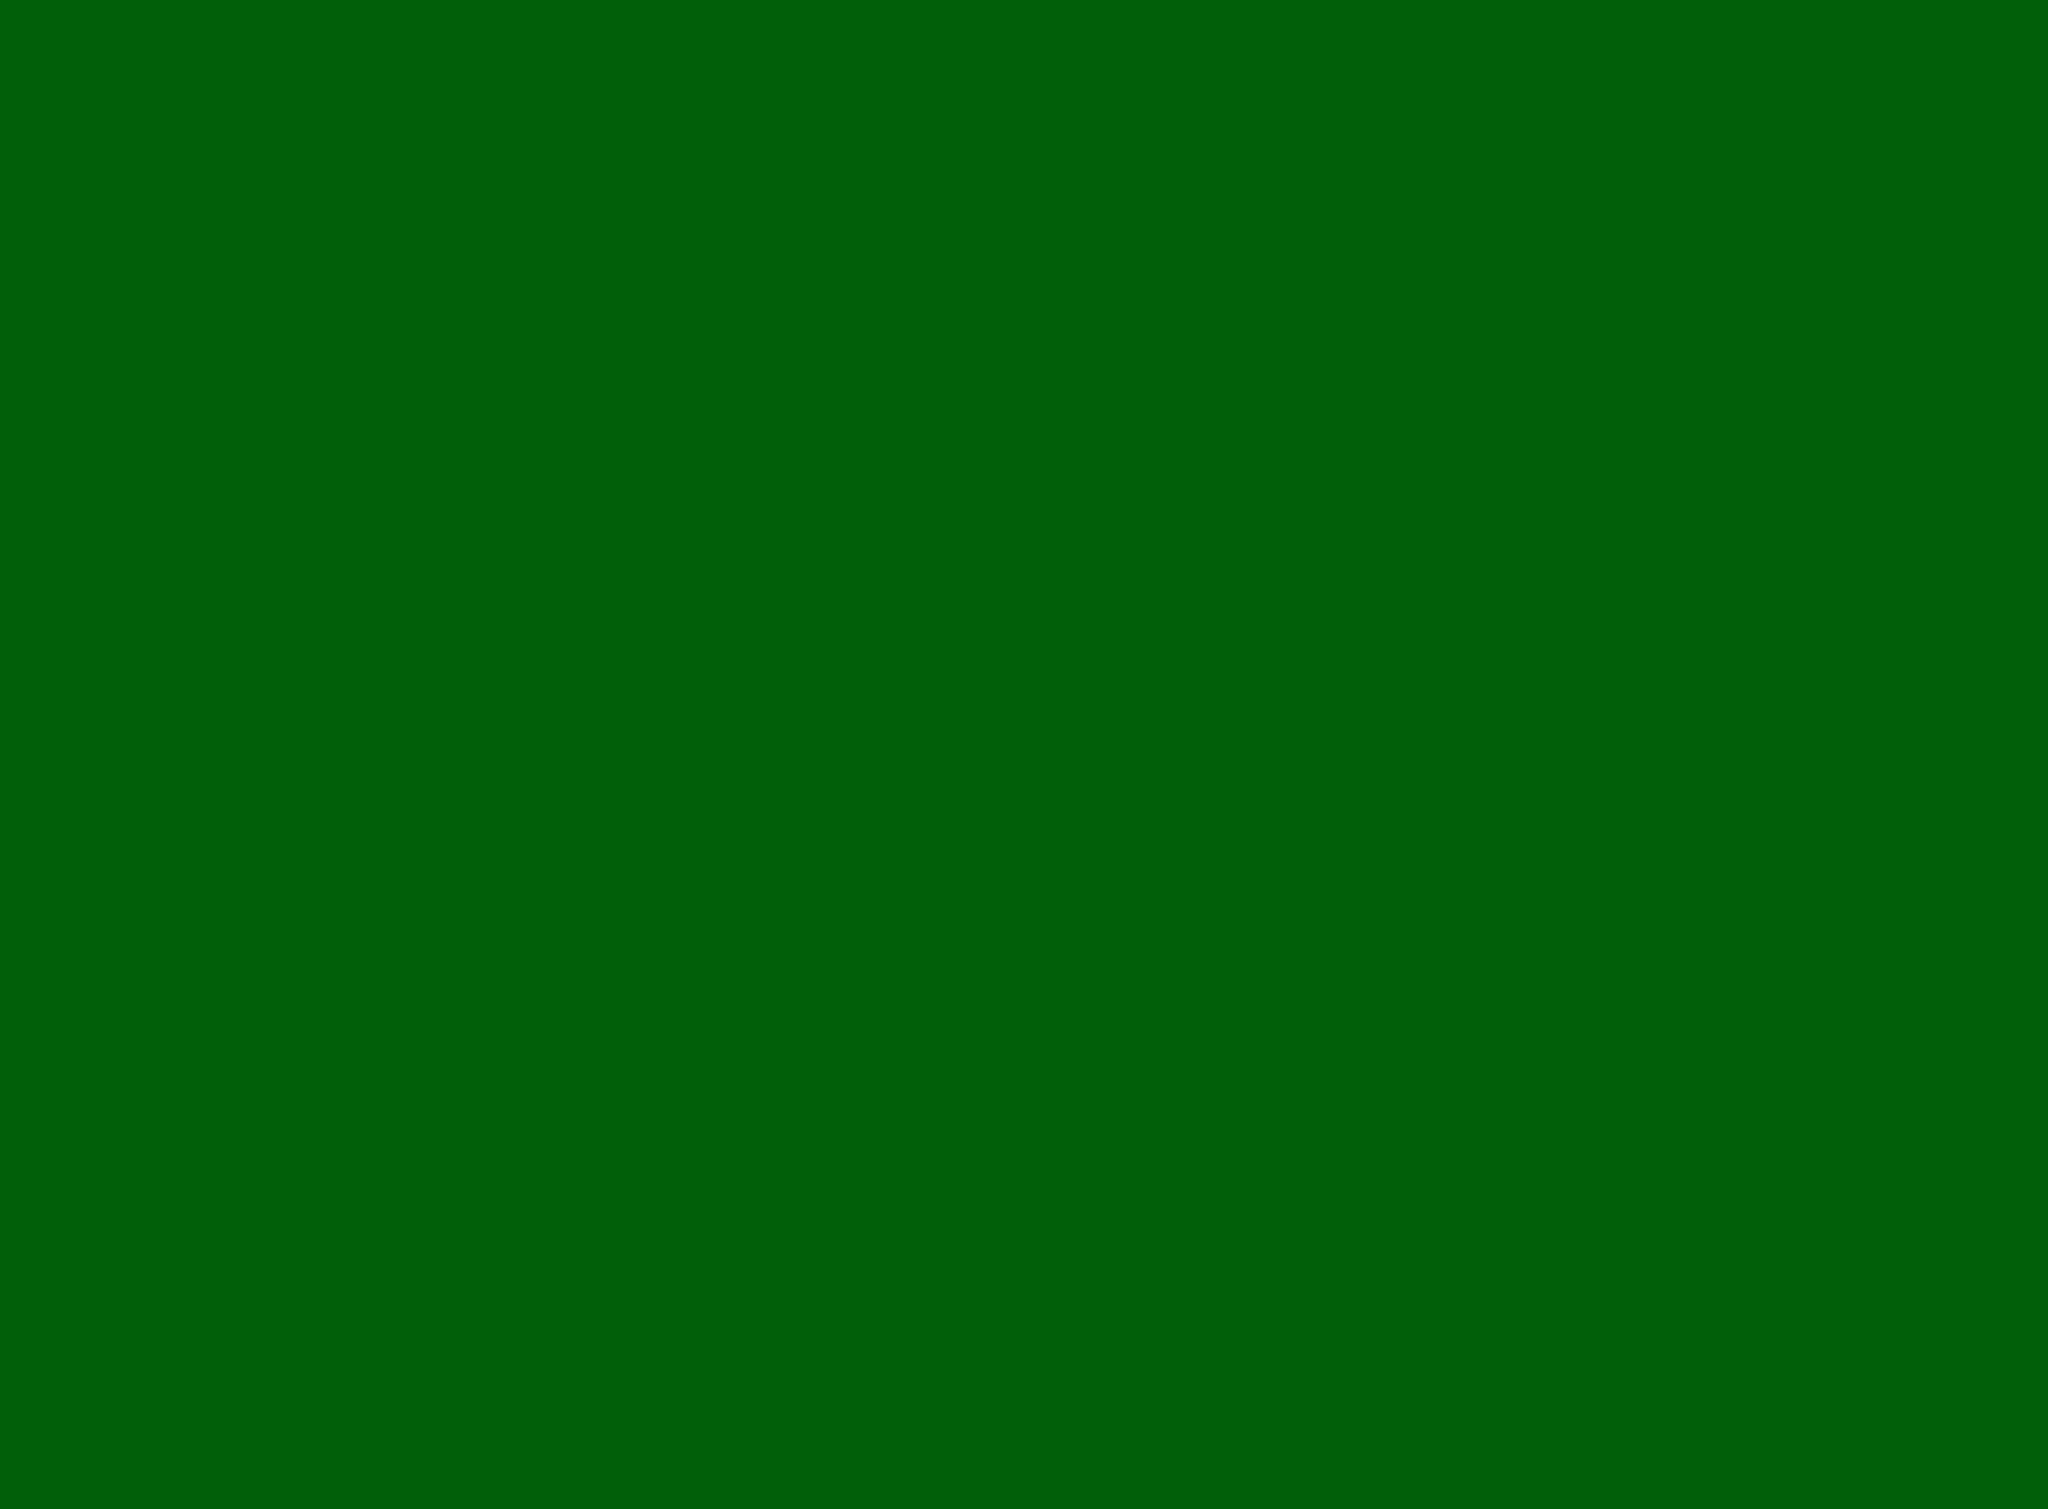 JPG Leaf-Green